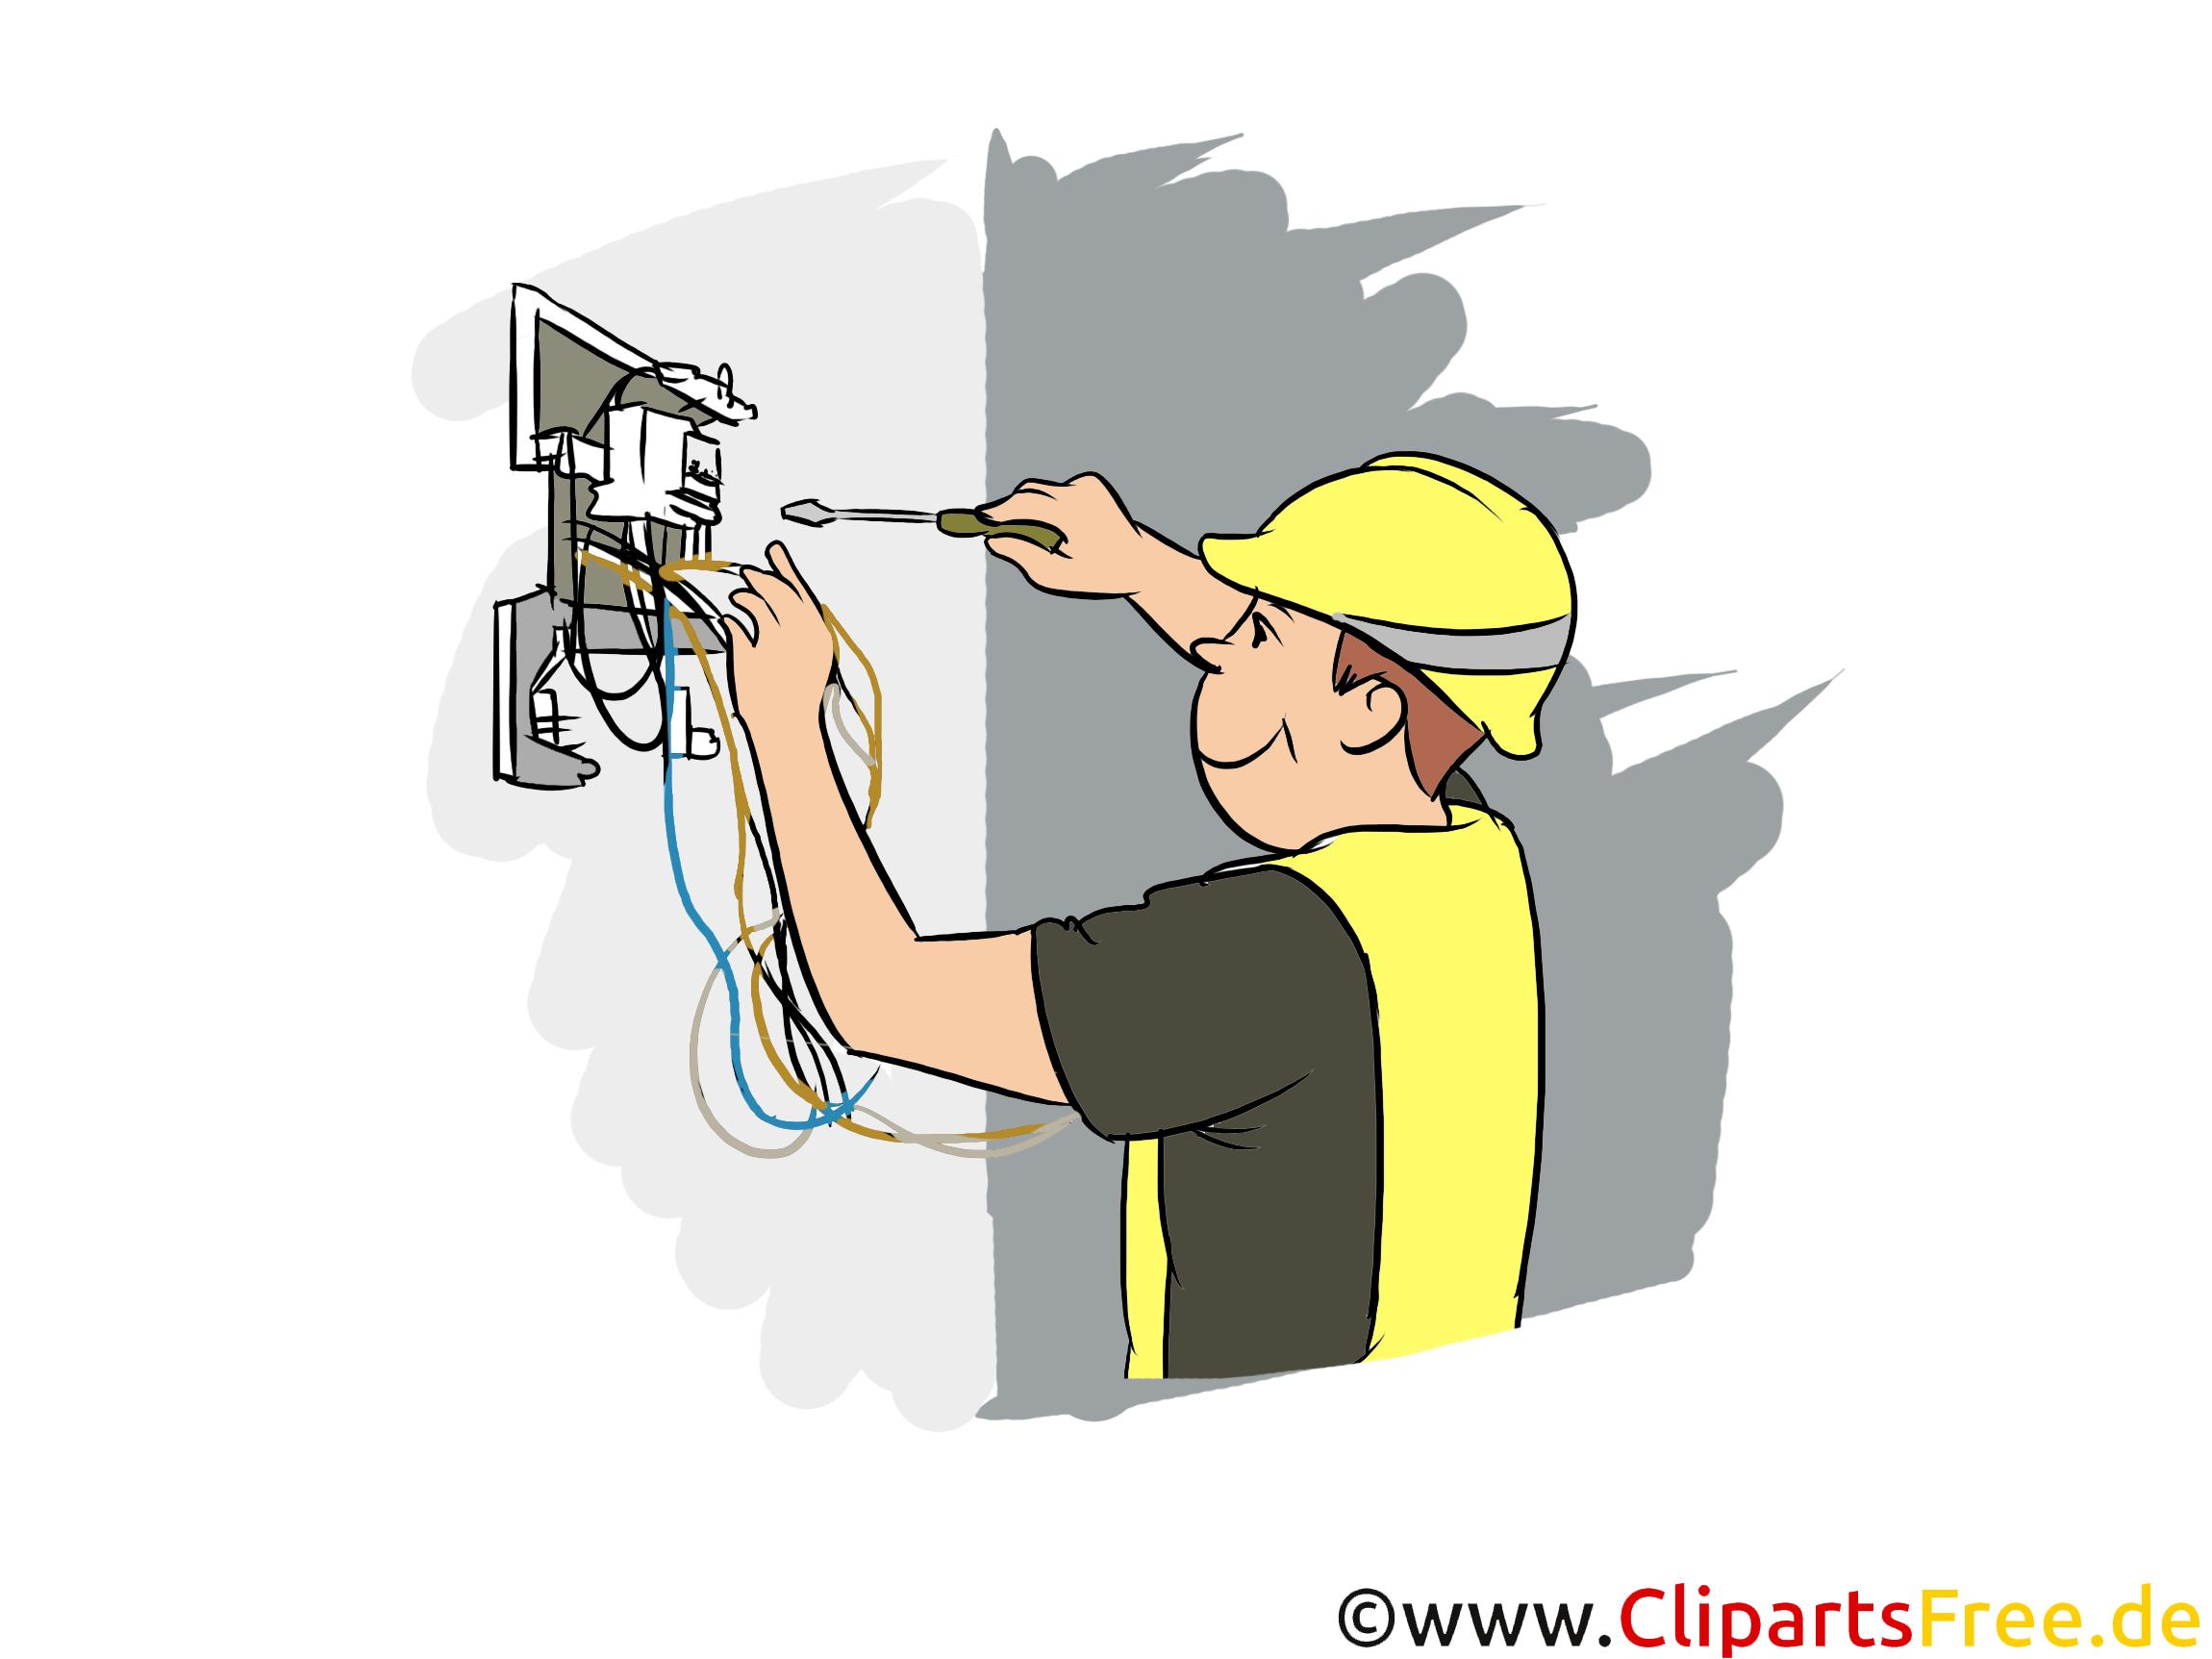 Elektriker Clipart, Bild, Grafik zum Thema Ausbildungsberufe